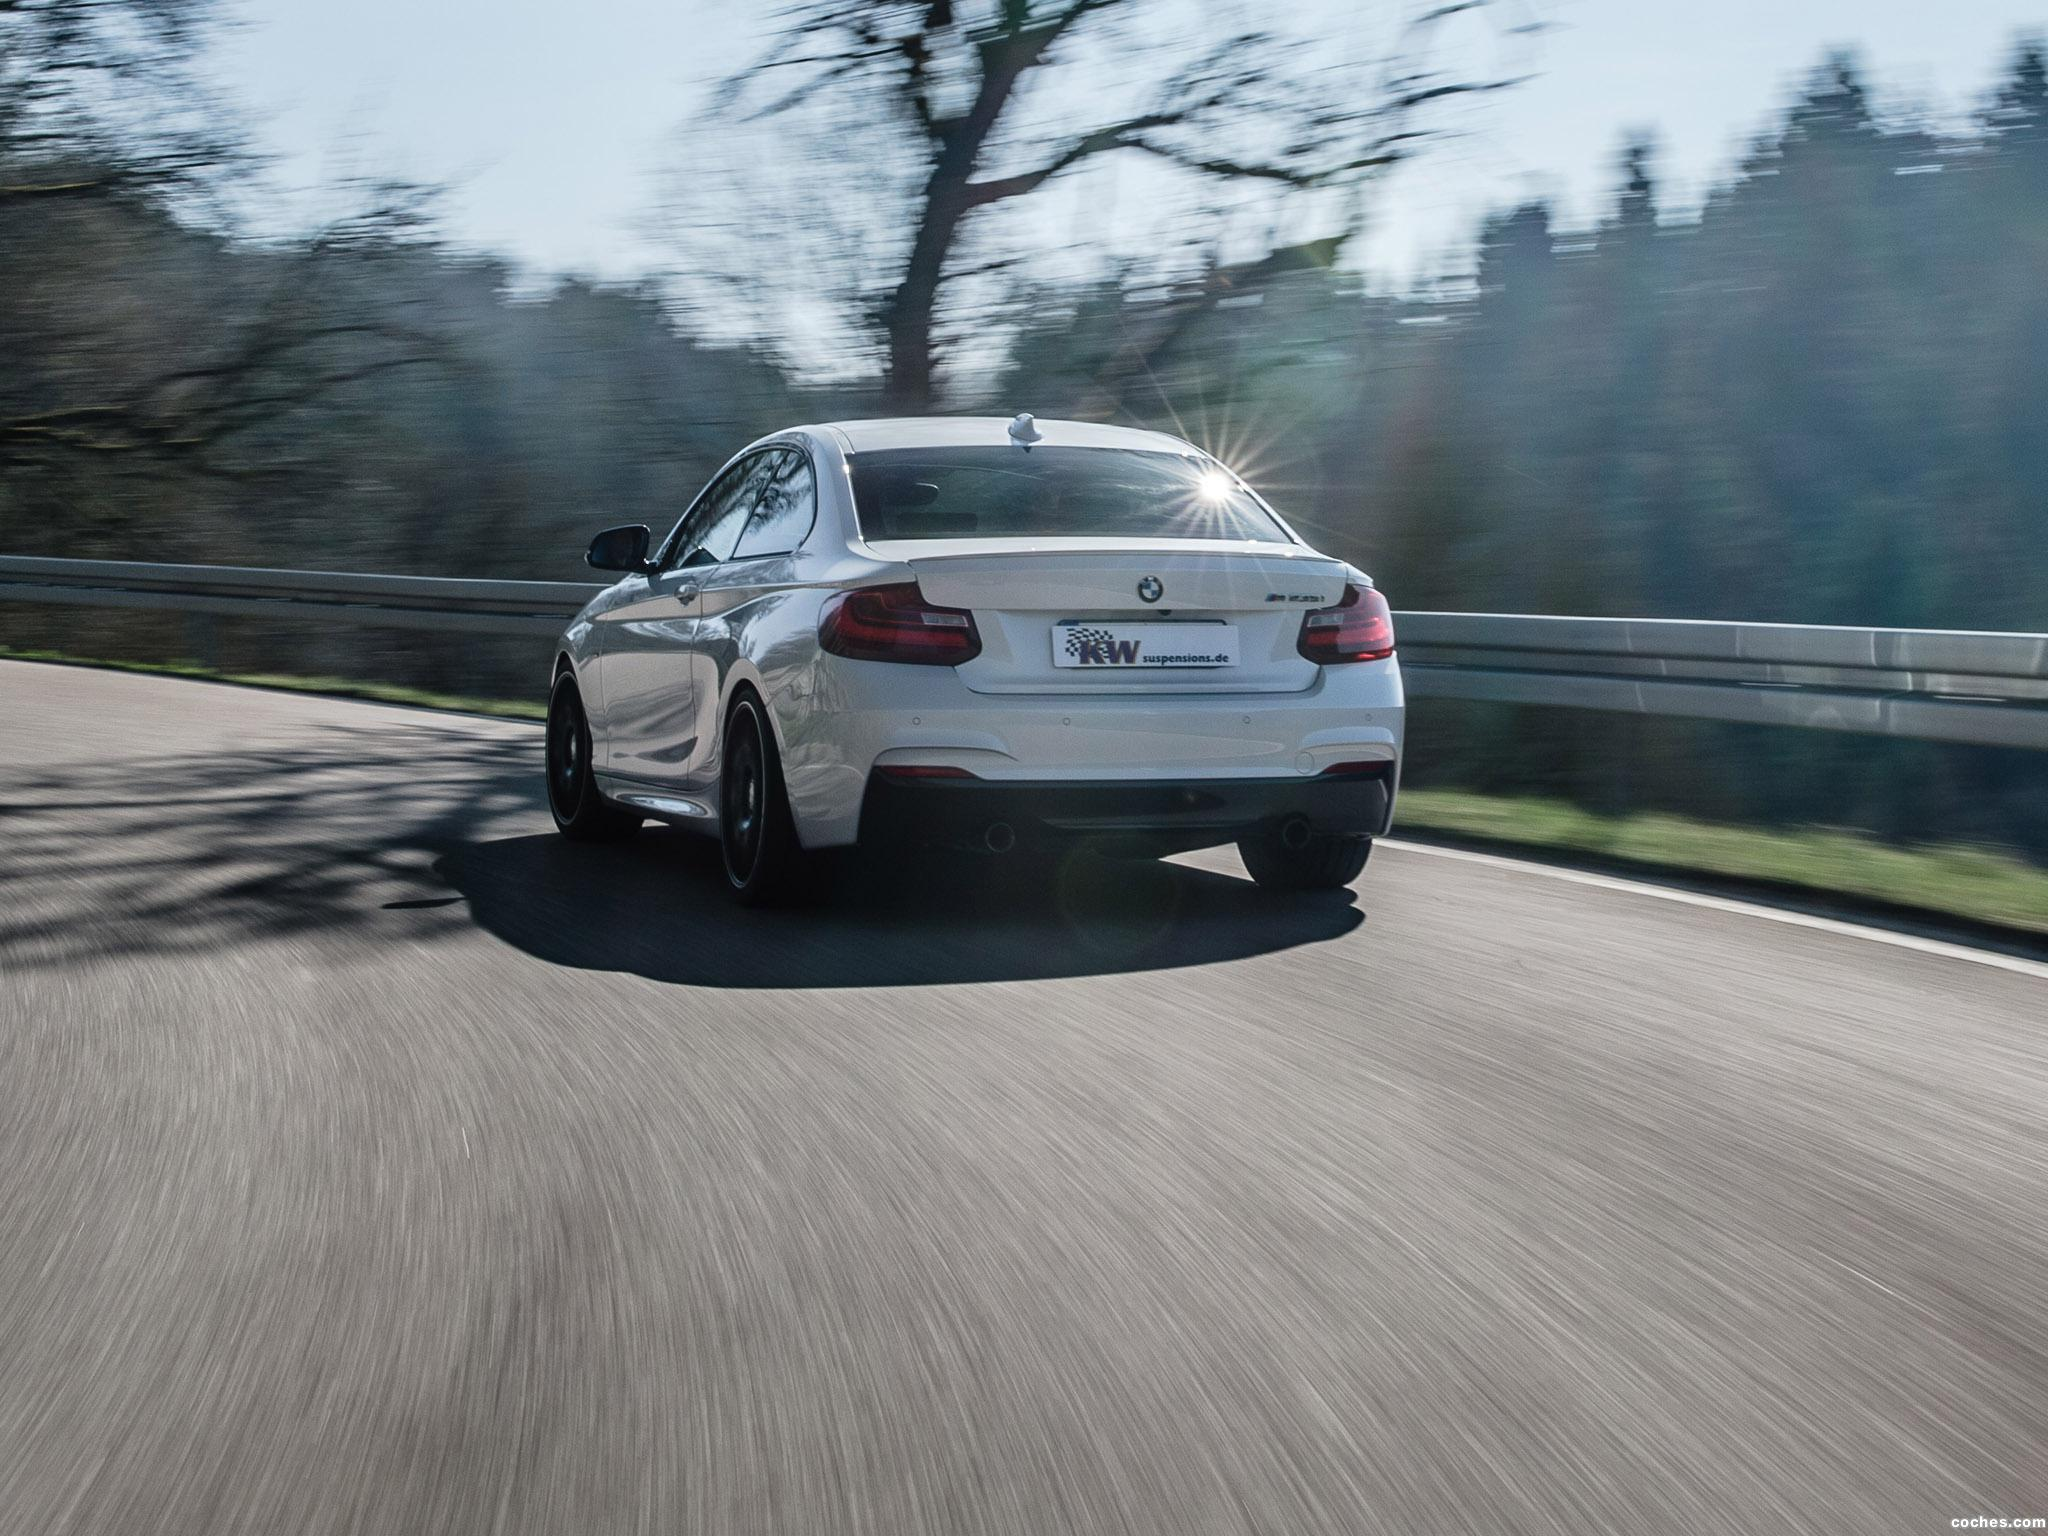 Foto 2 de BMW Serie 2 M235i KW Adaptive DDC Coilovers 2014